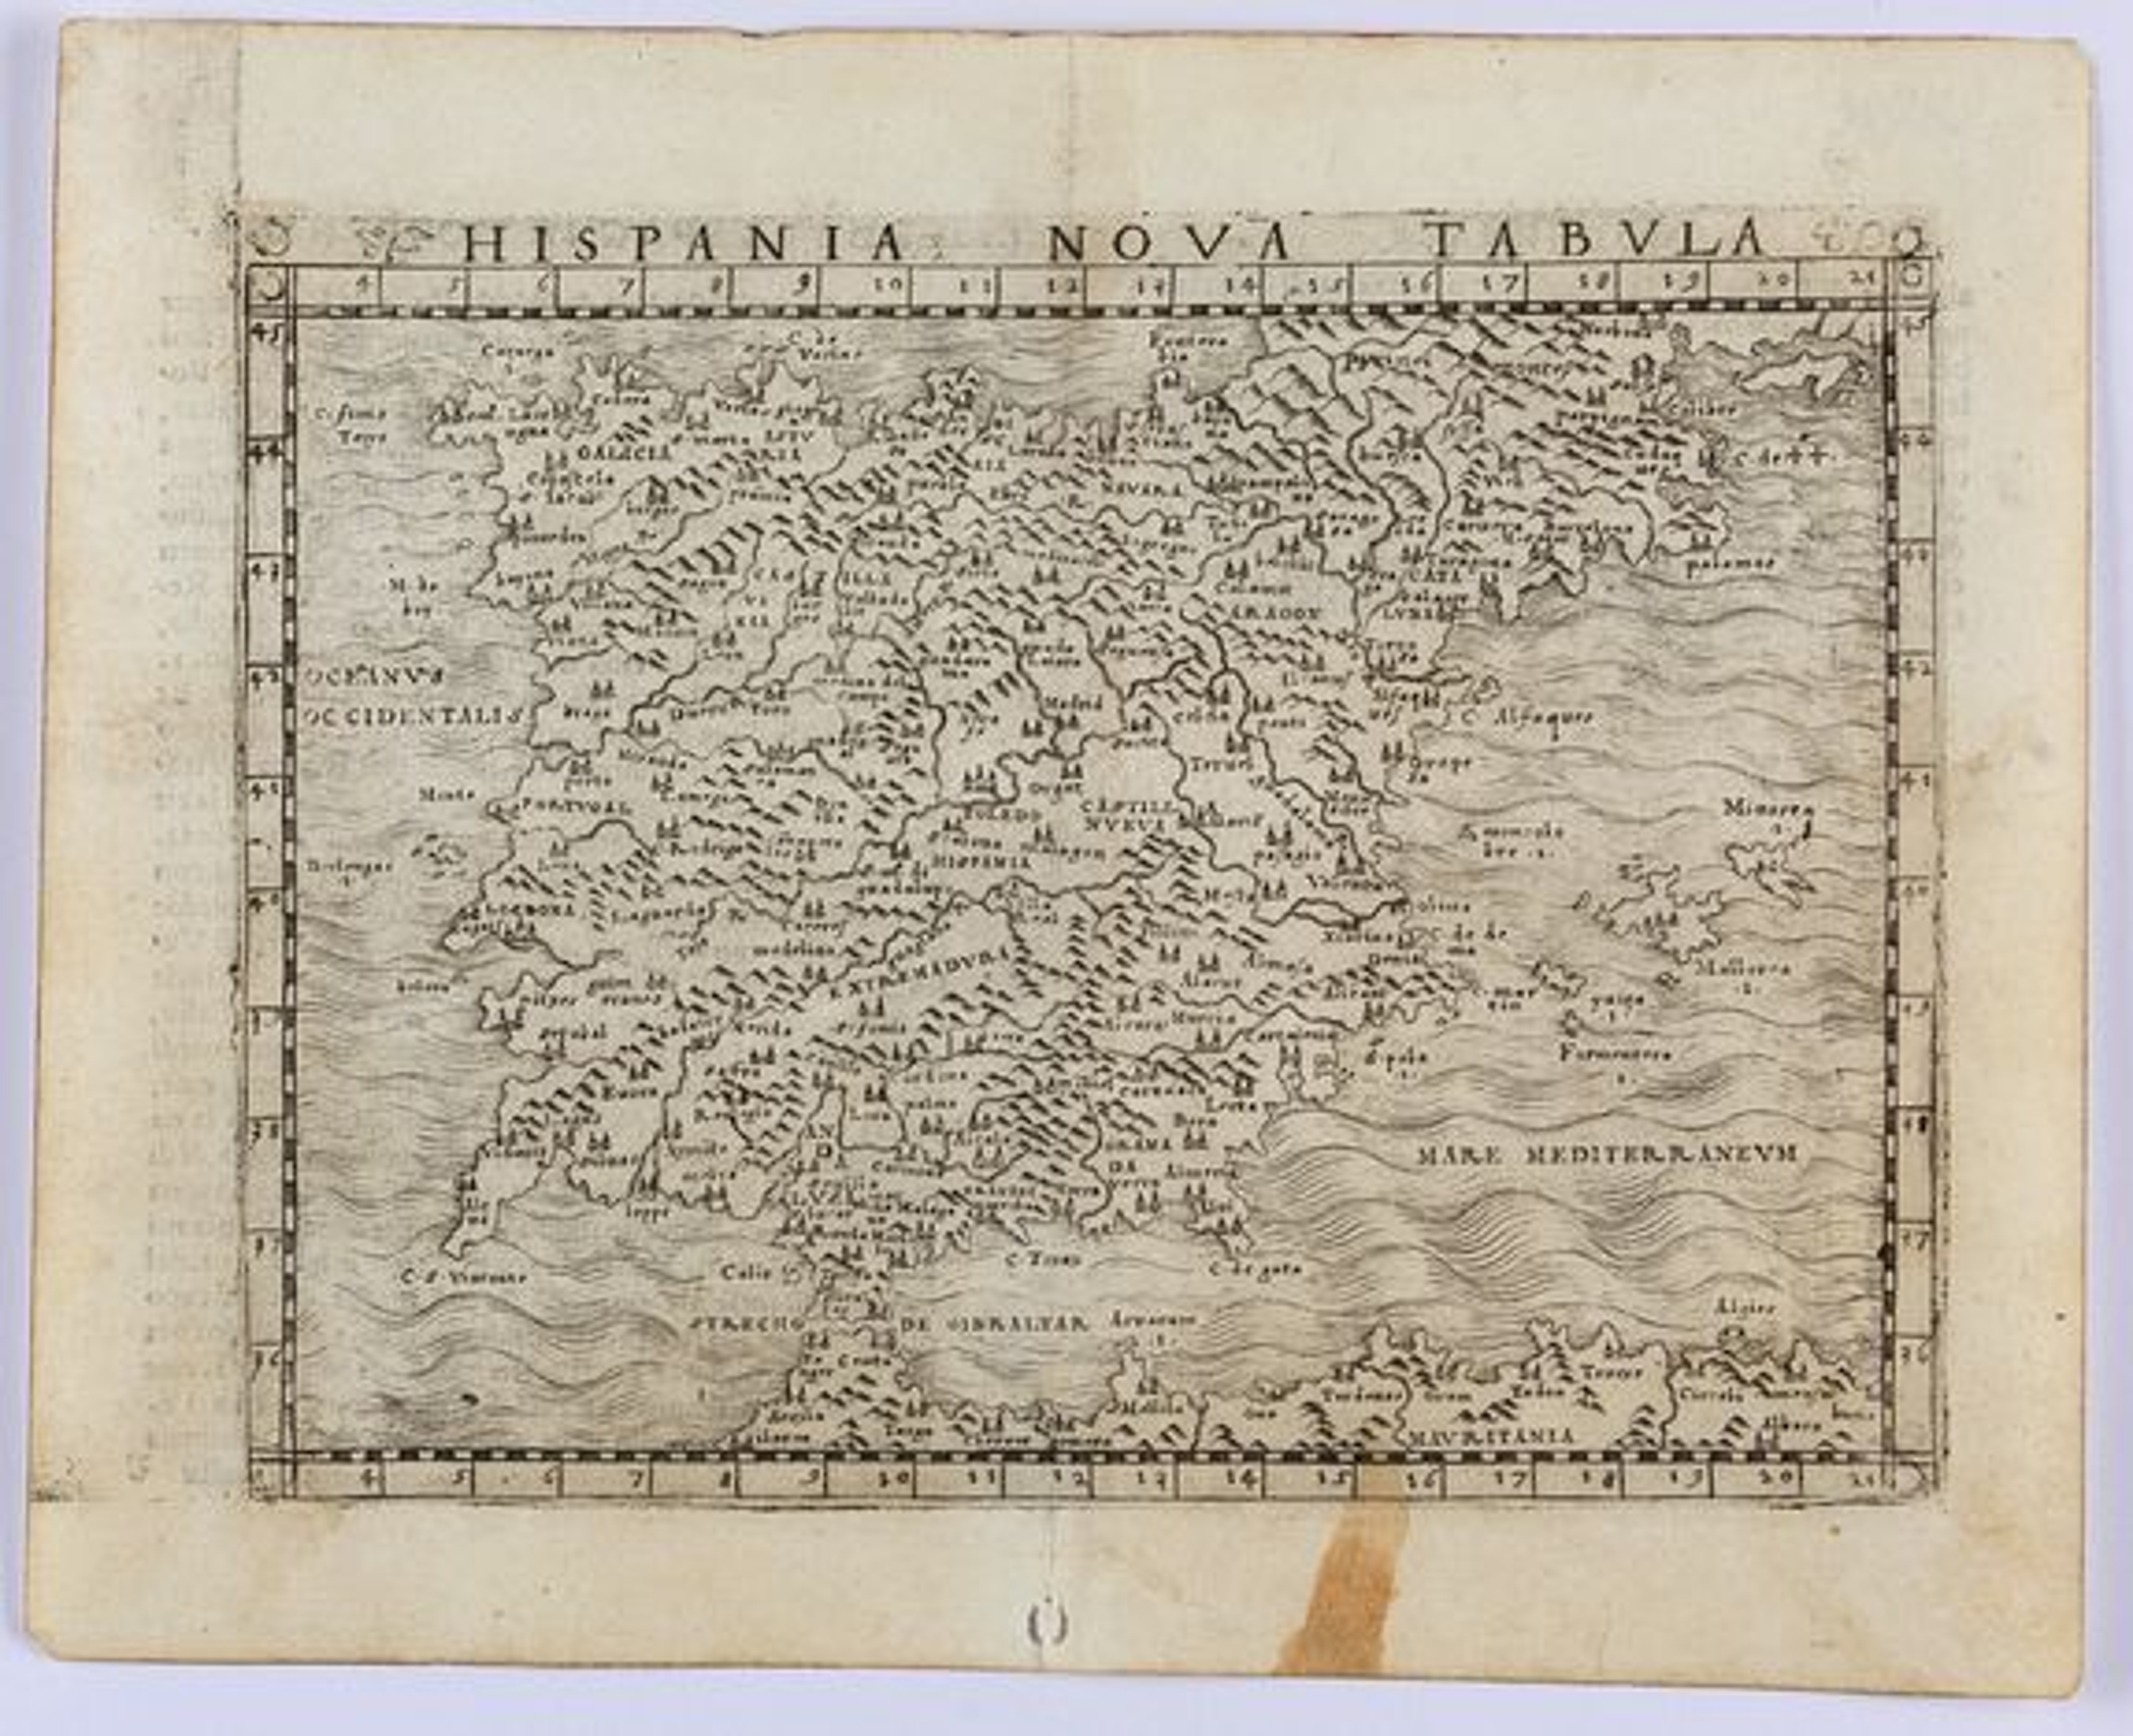 GASTALDI, G. -  Hispania Nova Tabula.